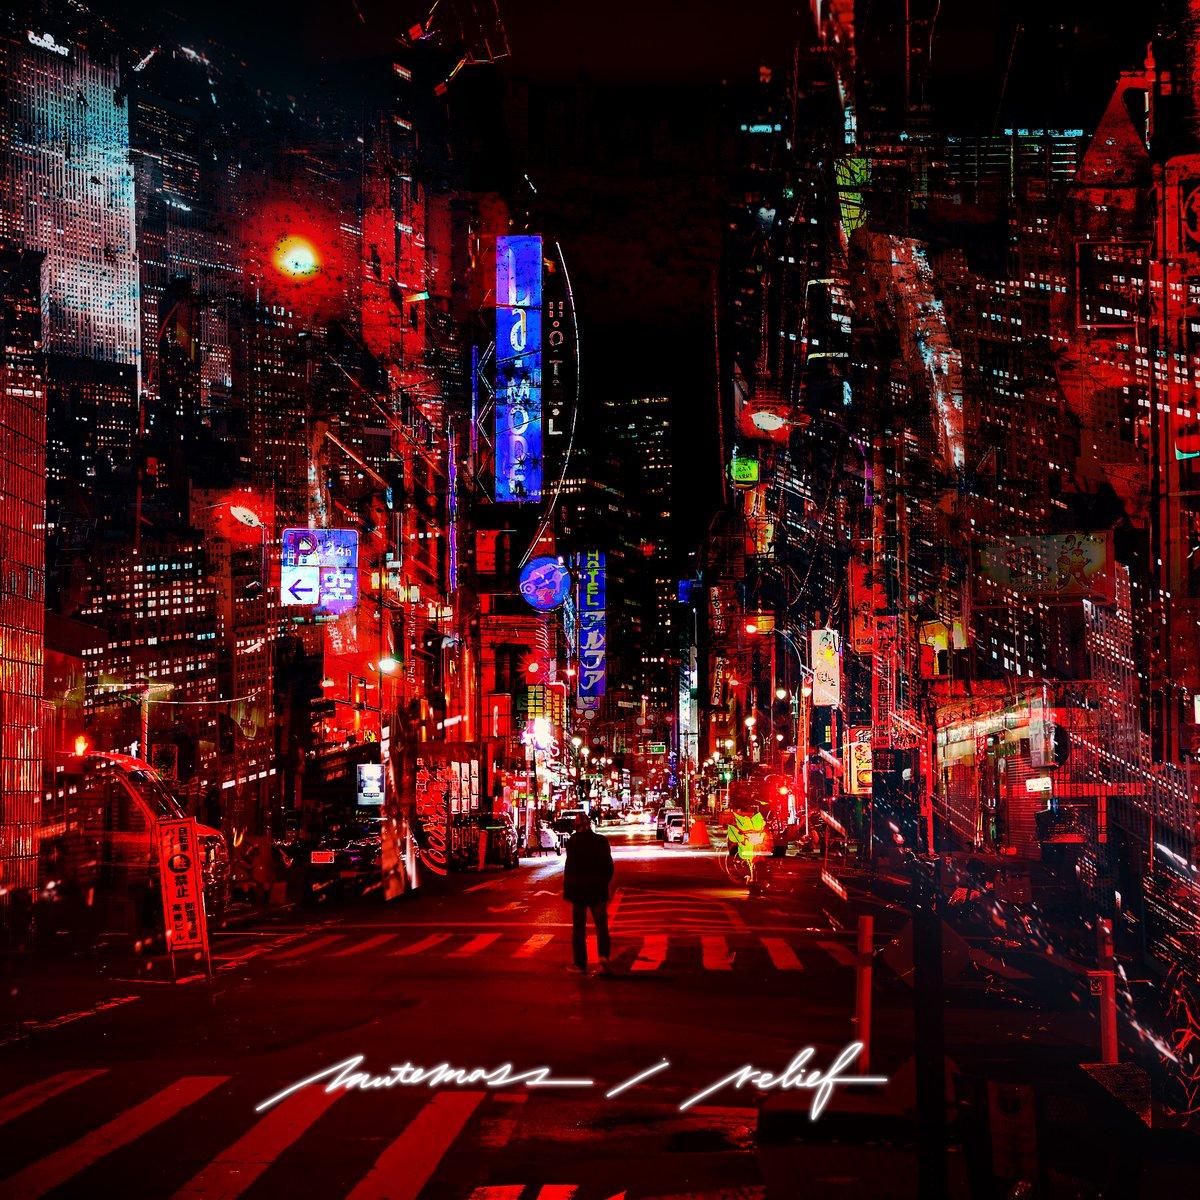 【New Release】 kyazm/  mutemass/relief @kyazm0511   🎧  プロデューサー、ギタリスト、レコーディングエンジニア、楽曲提供やRemixなど多岐にわたって活躍するkyazm。よりポップに昇華したビート/ダンスミュージックで踊れそうな2曲入りシングル